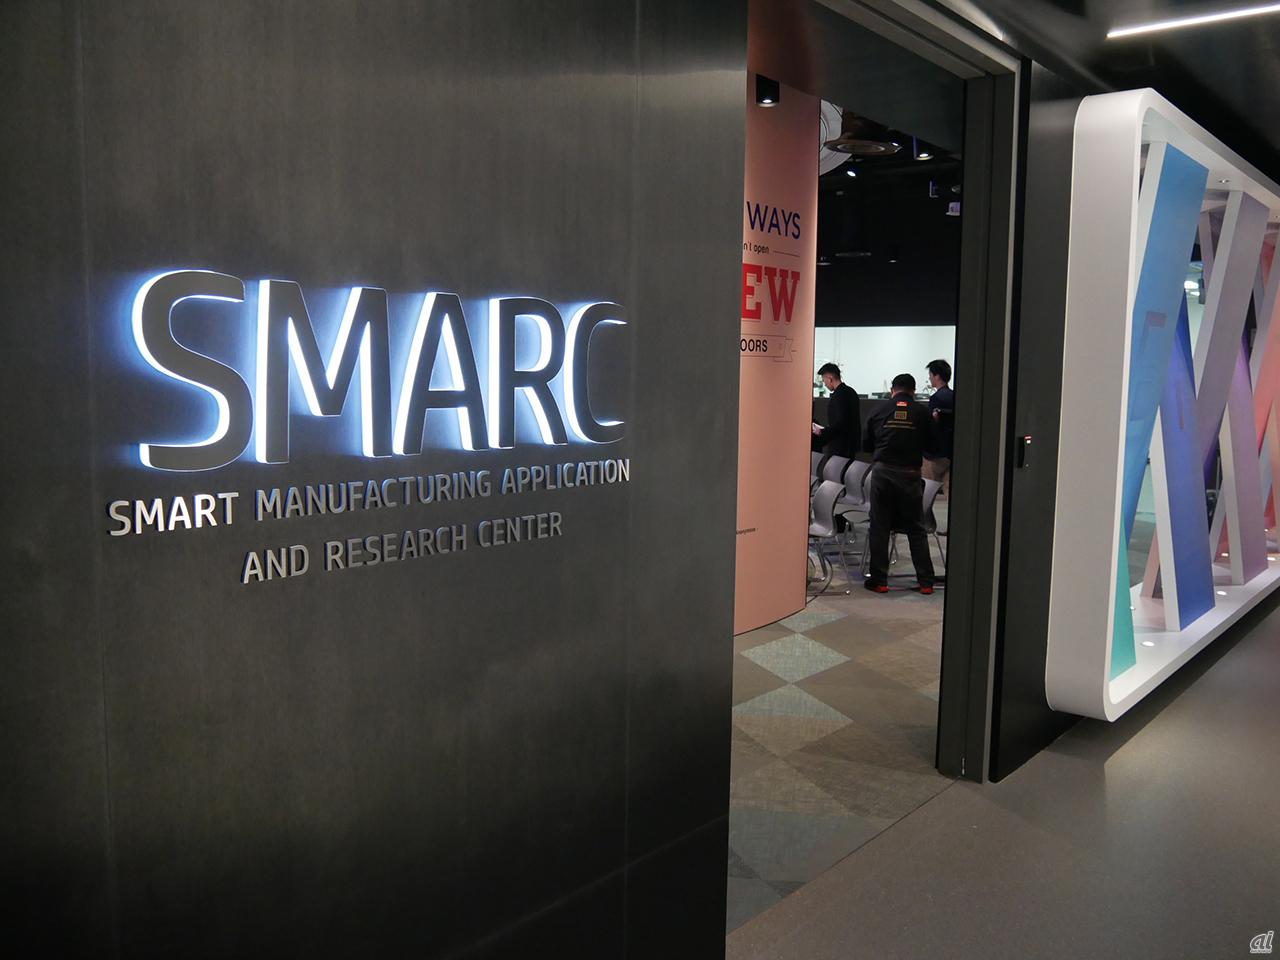 HPの最先端施設「SMARC」に見る製造技術の未来